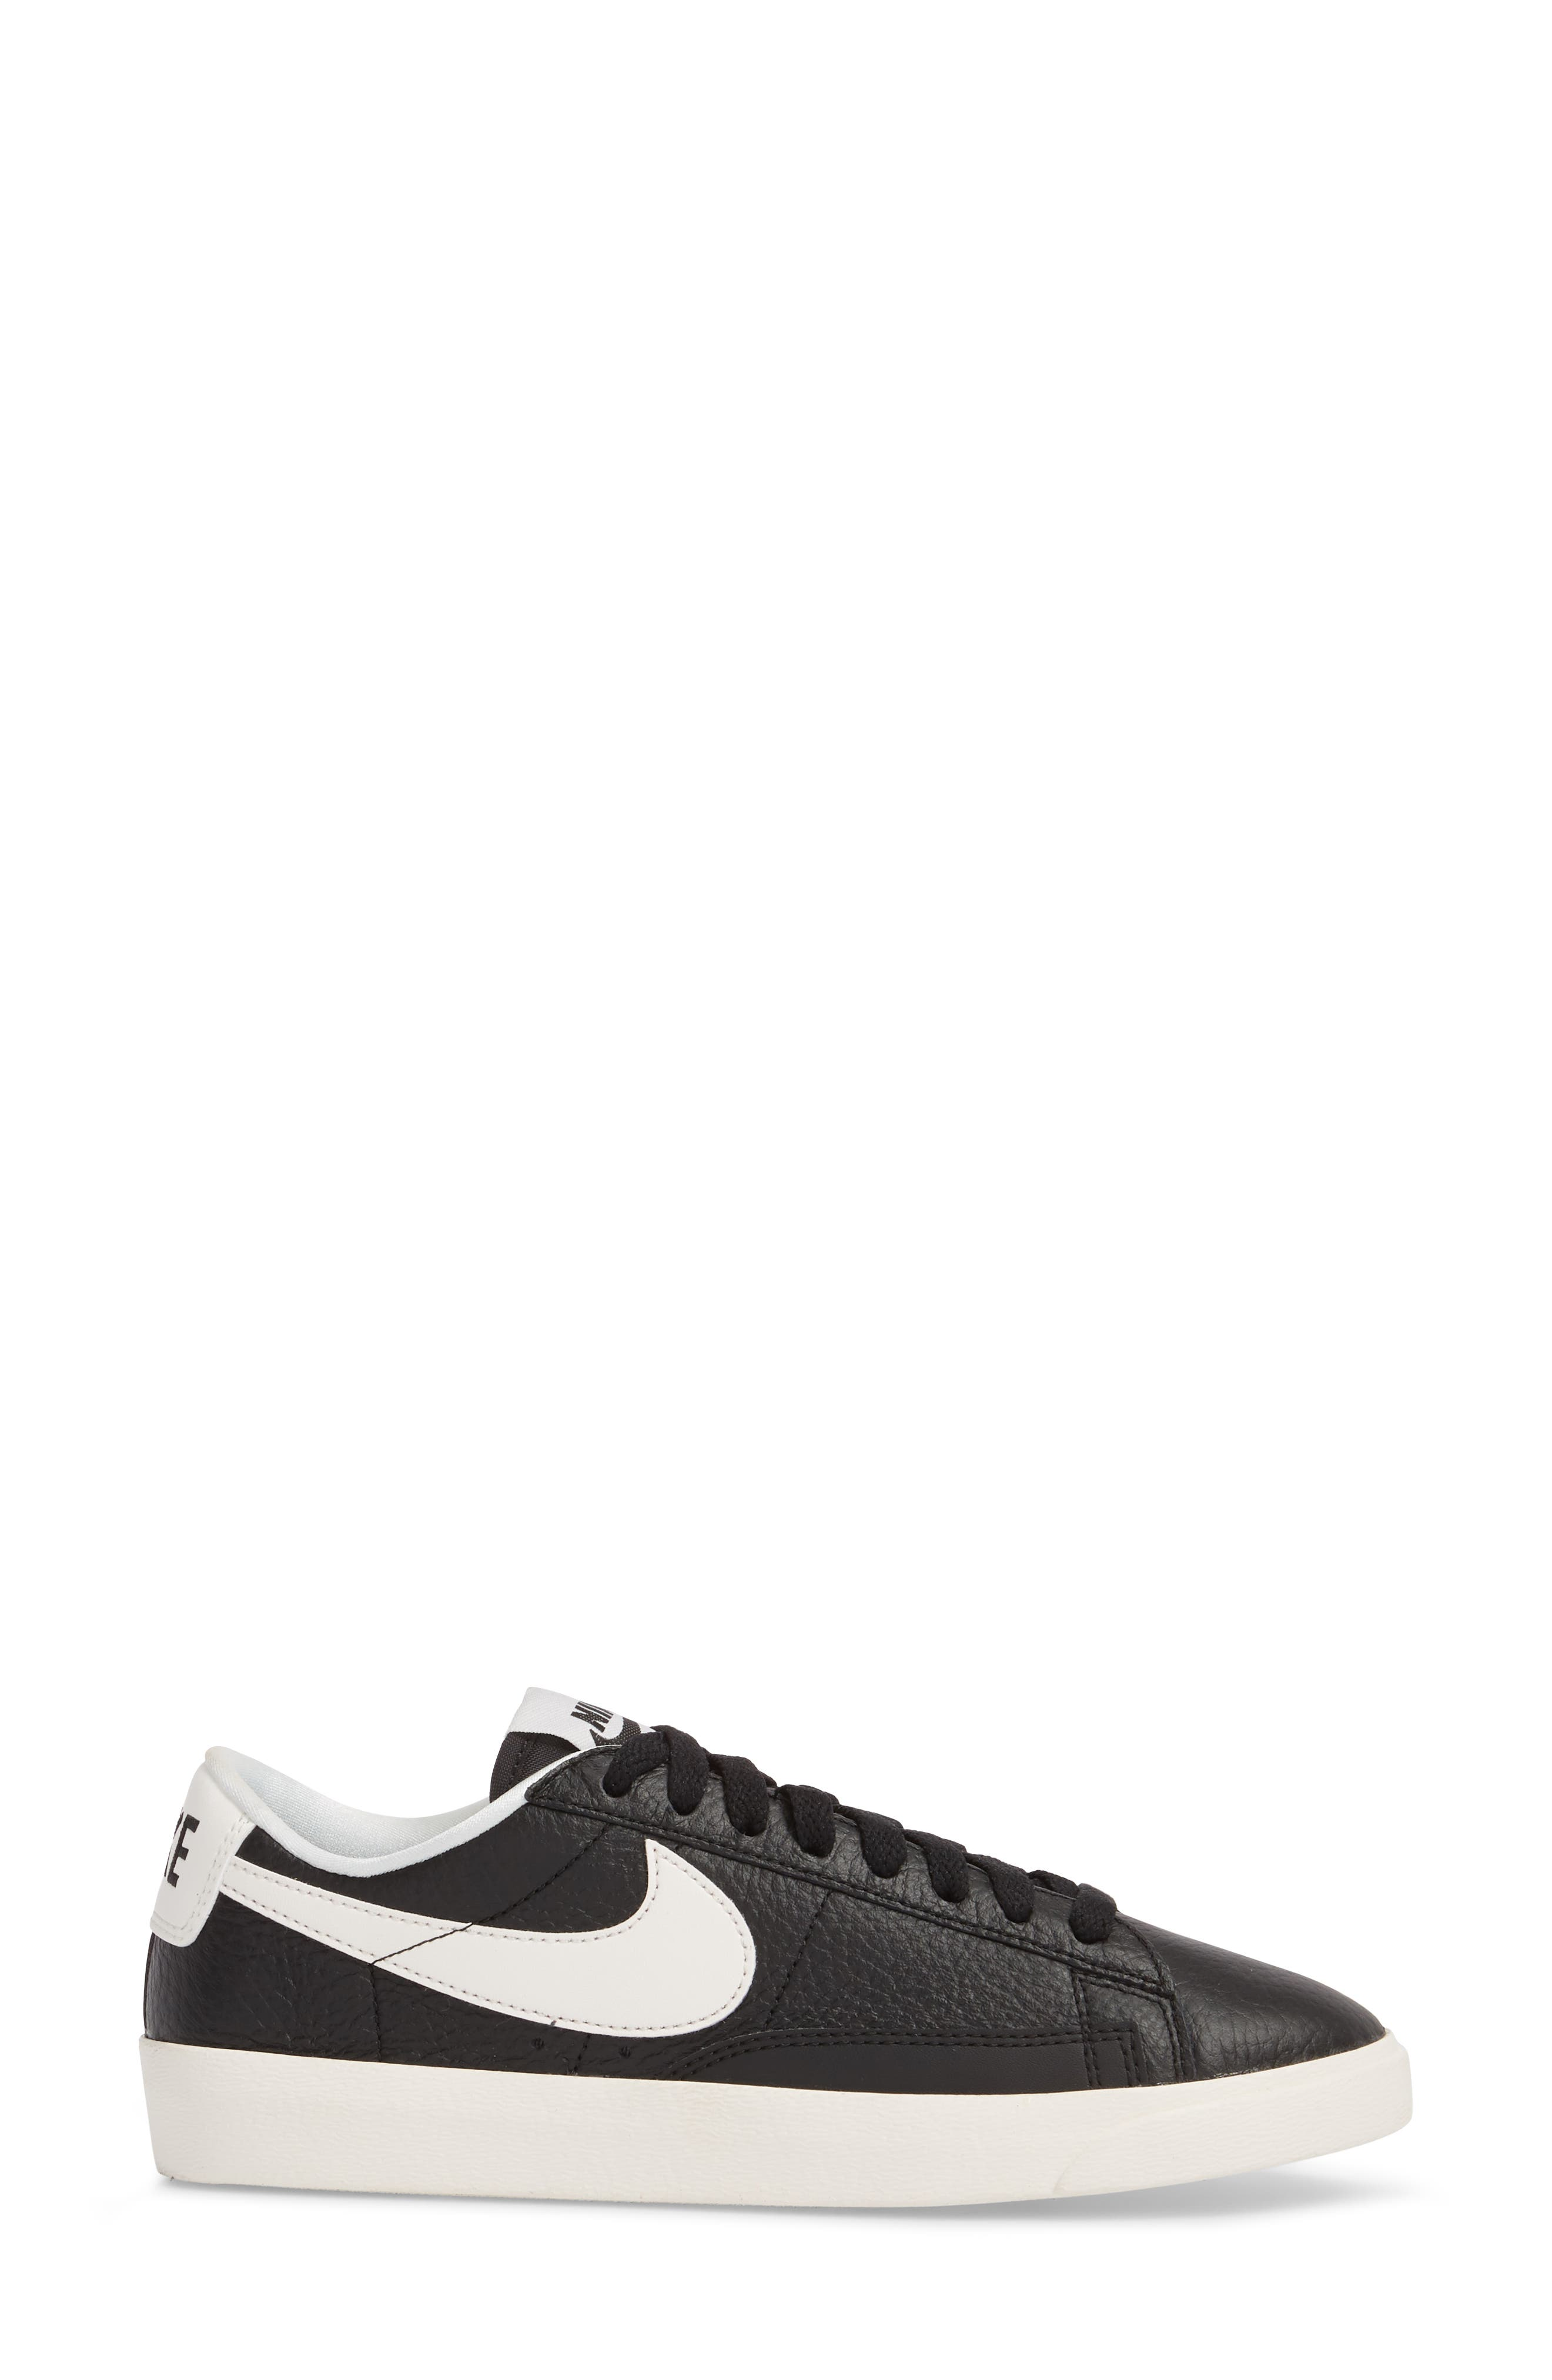 Blazer Premium Low Sneaker,                             Alternate thumbnail 3, color,                             004